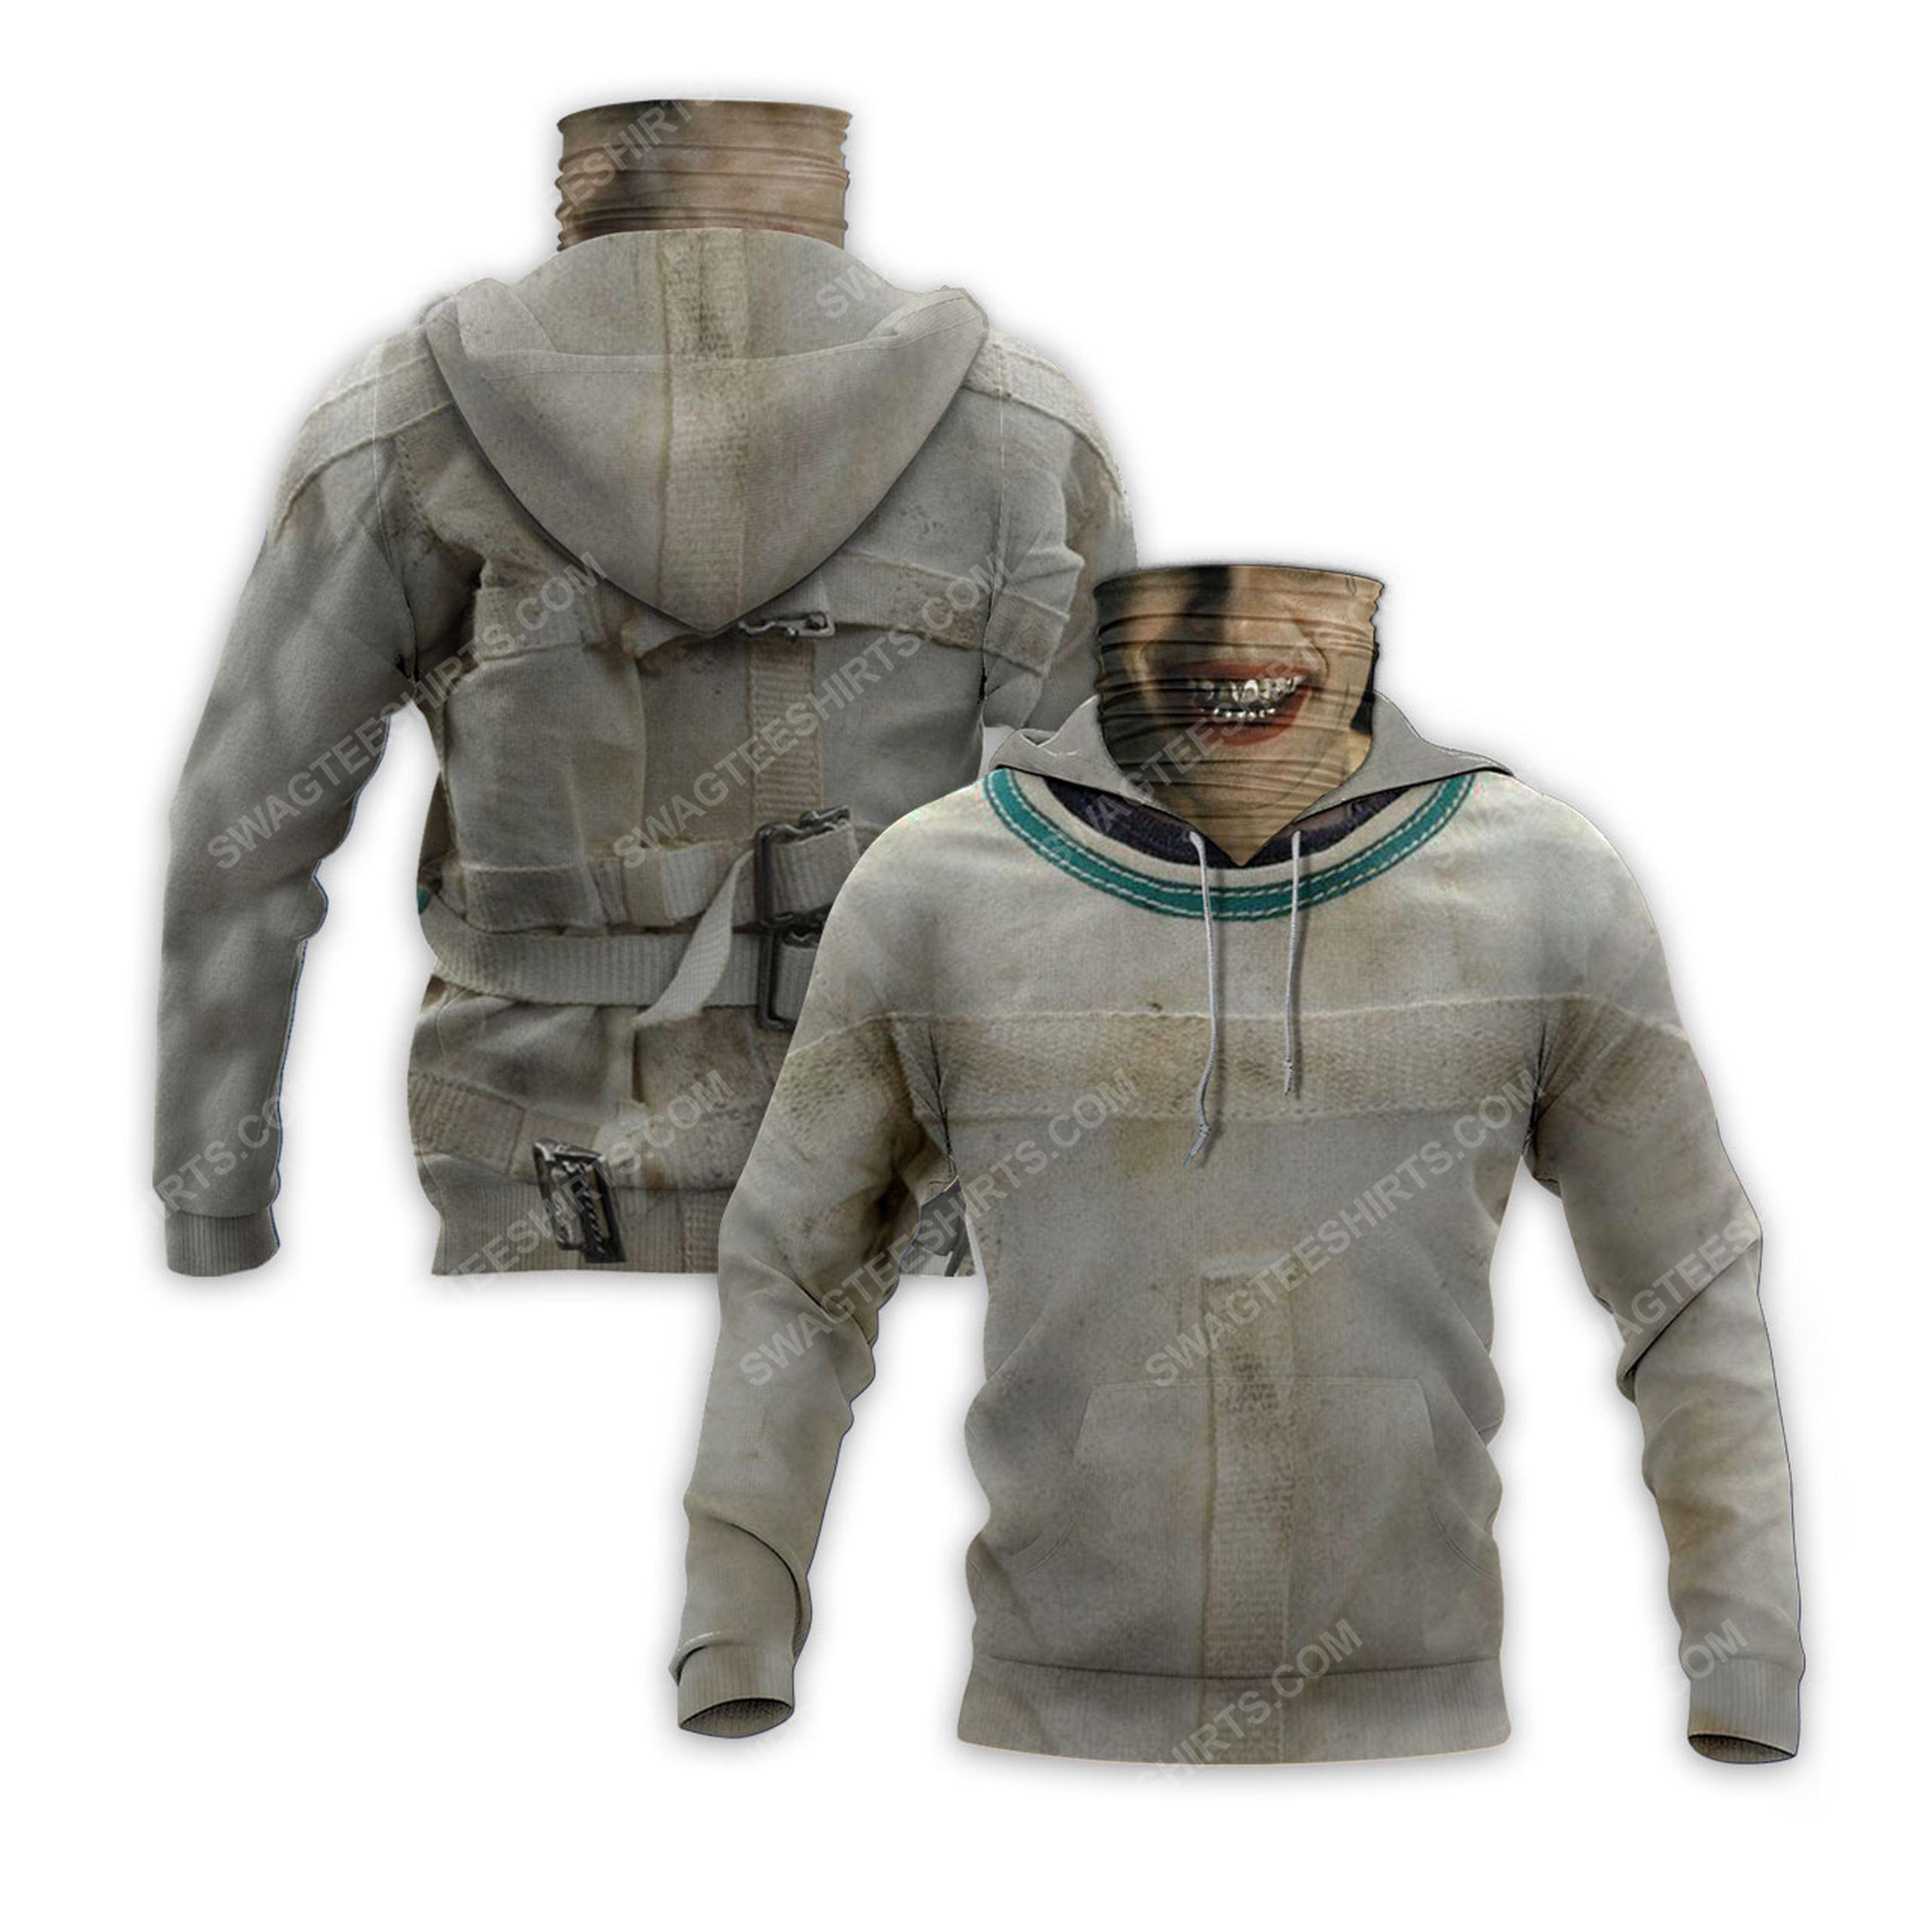 Joker suicide squad full print mask hoodie 2(1)